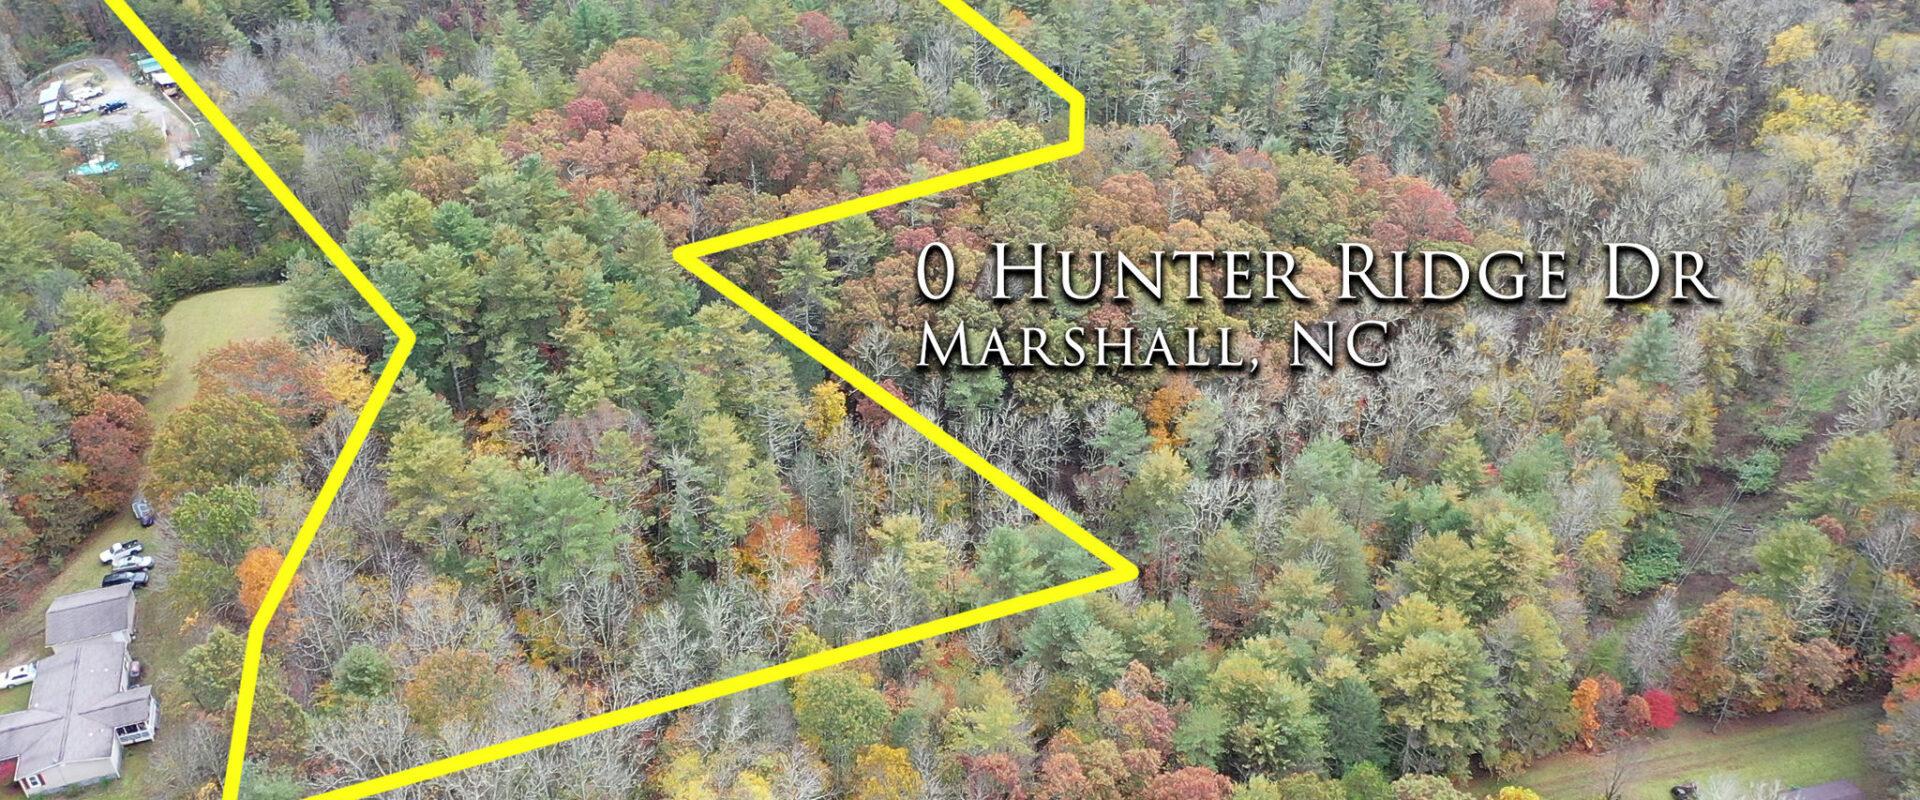 0 Hunter Ridge Rd Marshall NC